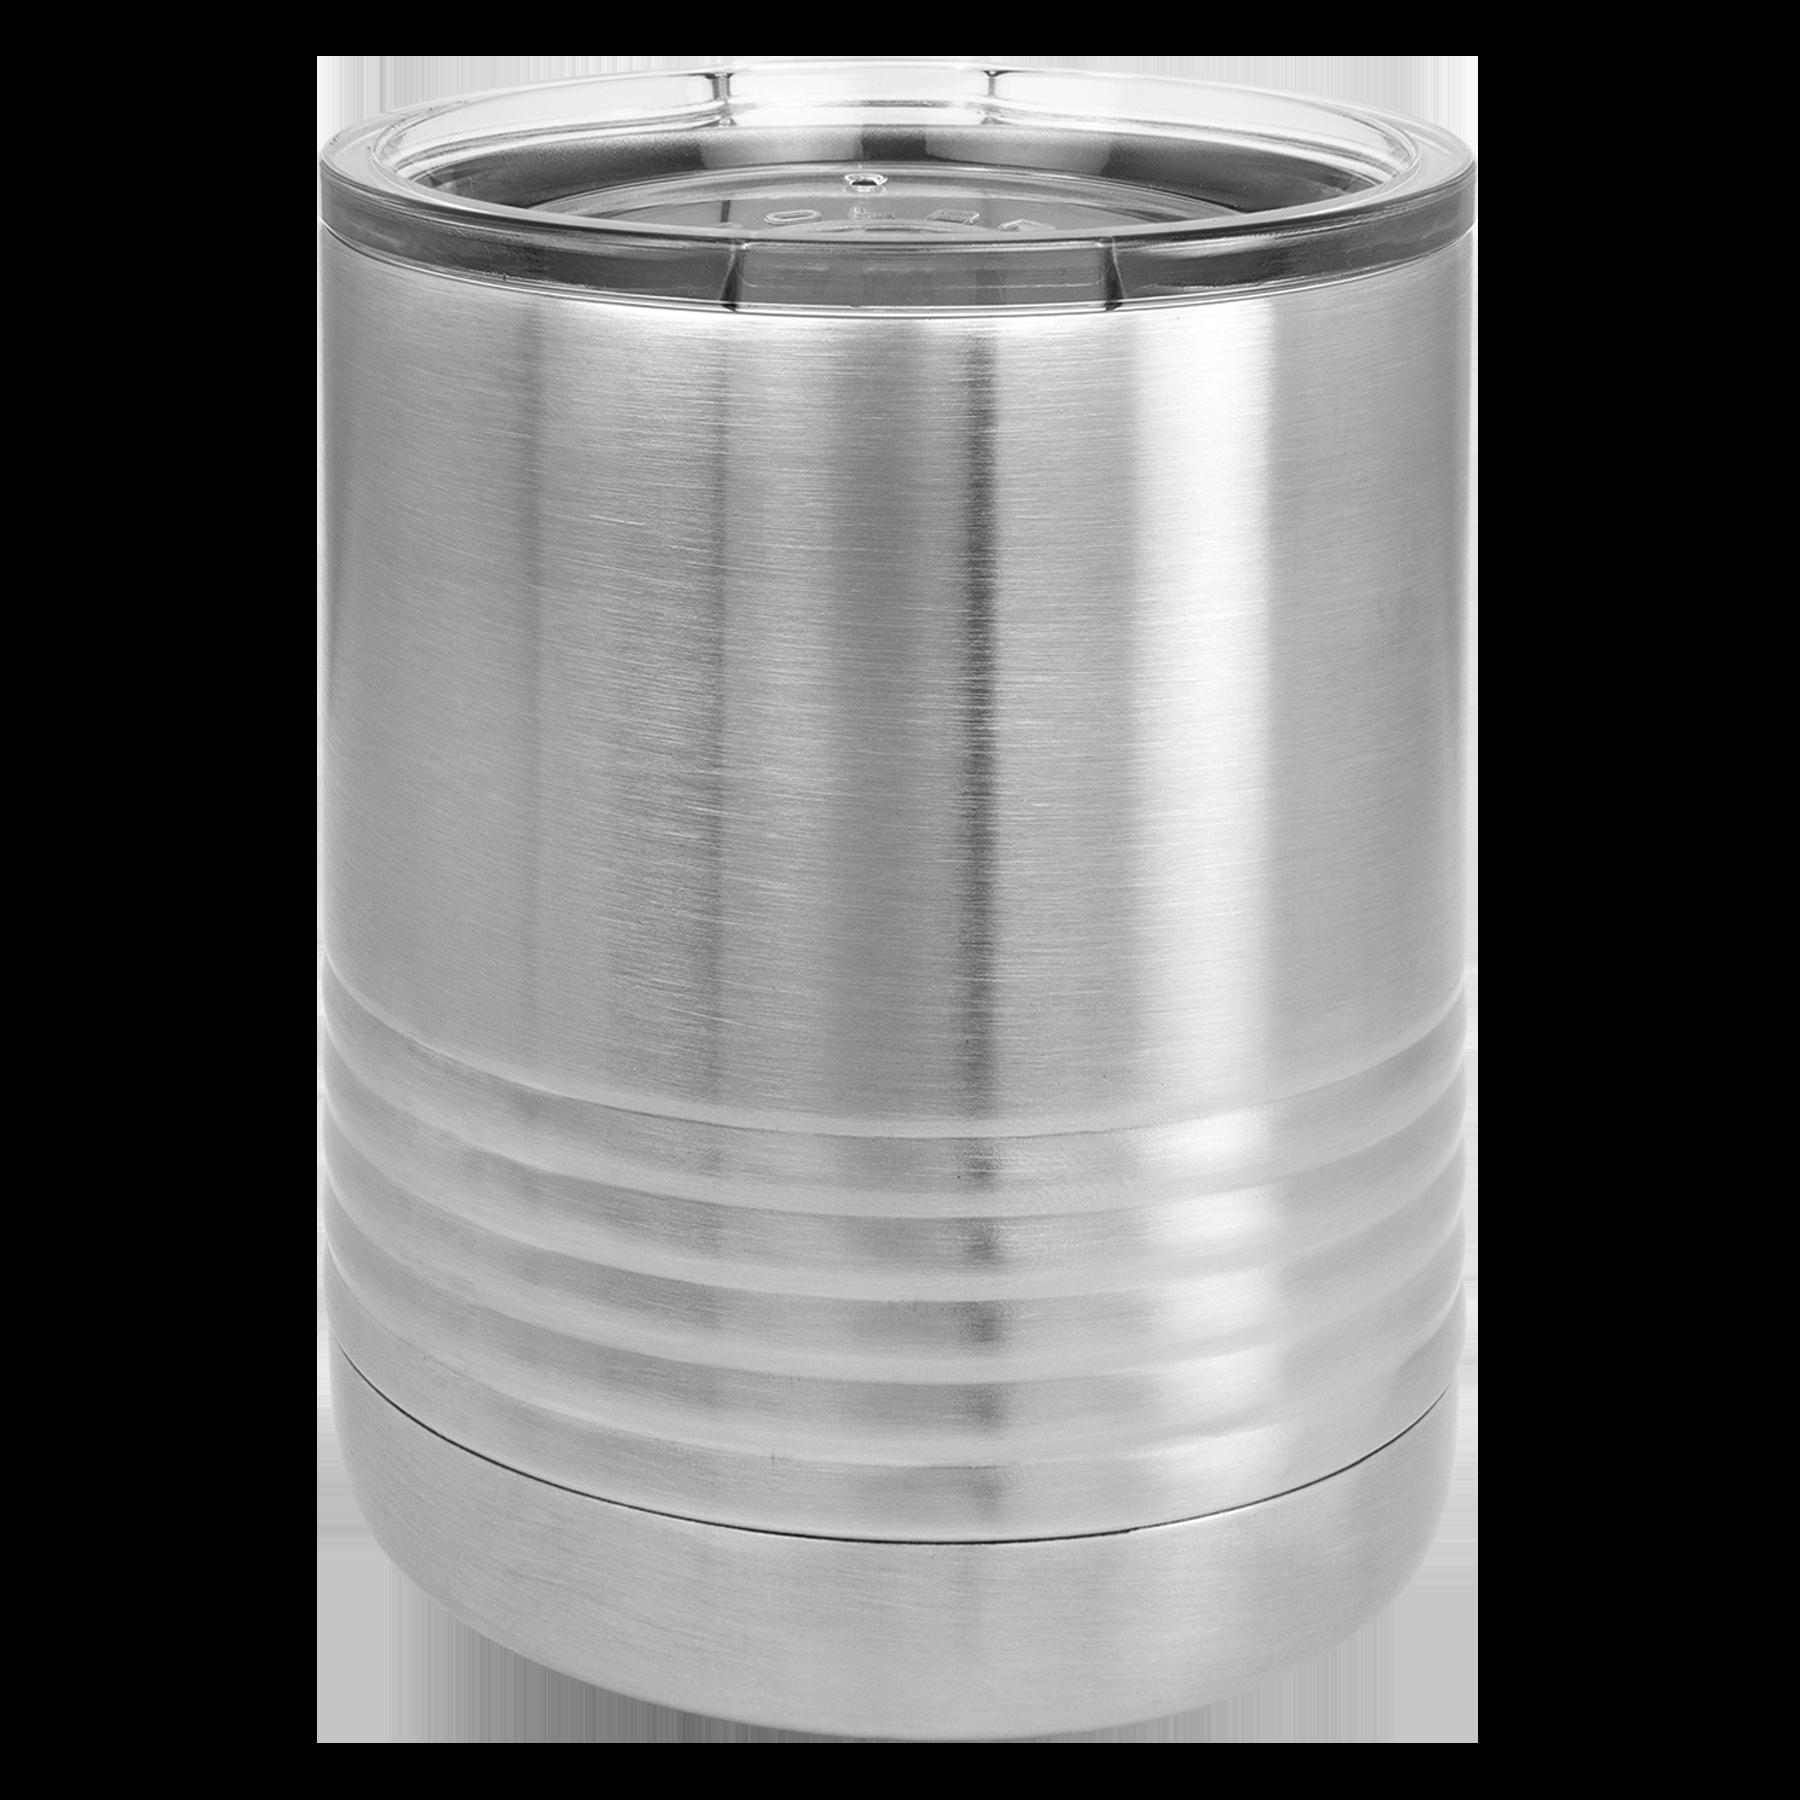 10 oz Tumbler -  Stainless Steel LTM710x